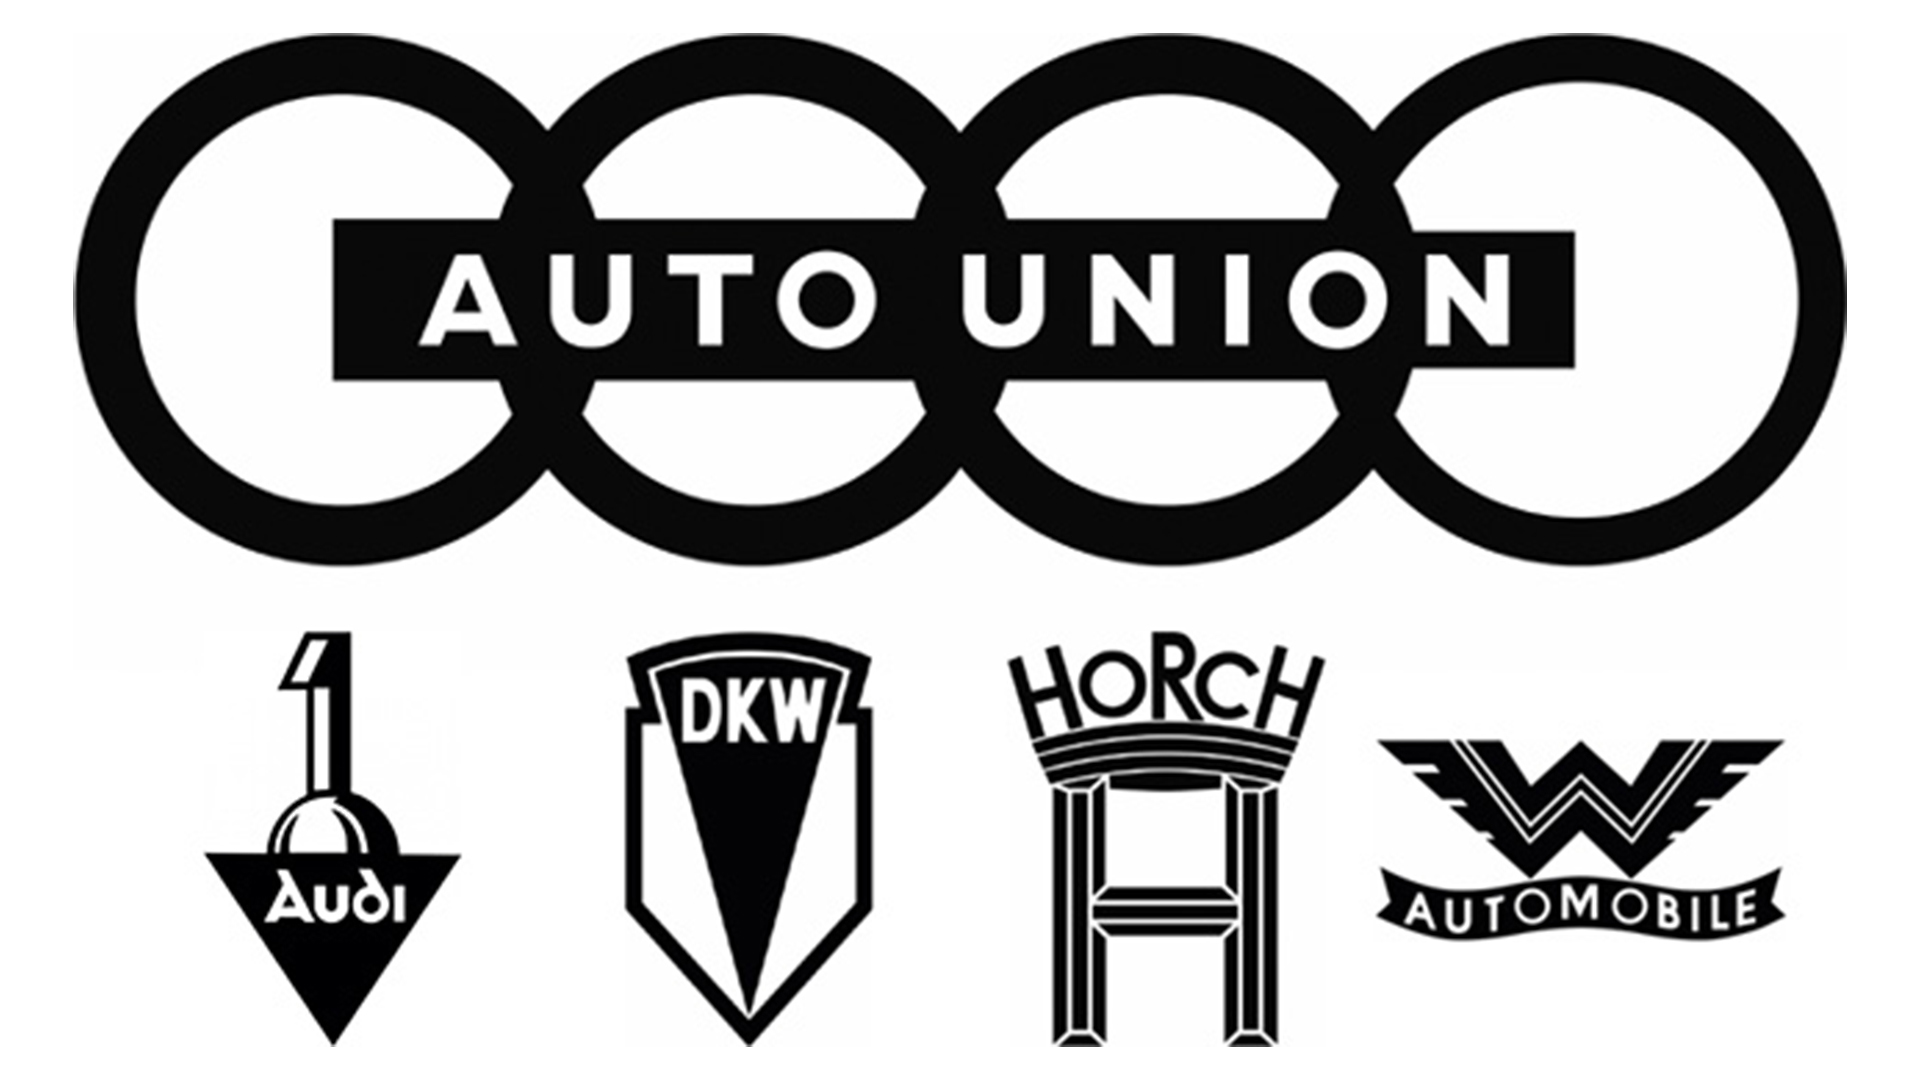 Эмблема Auto Union